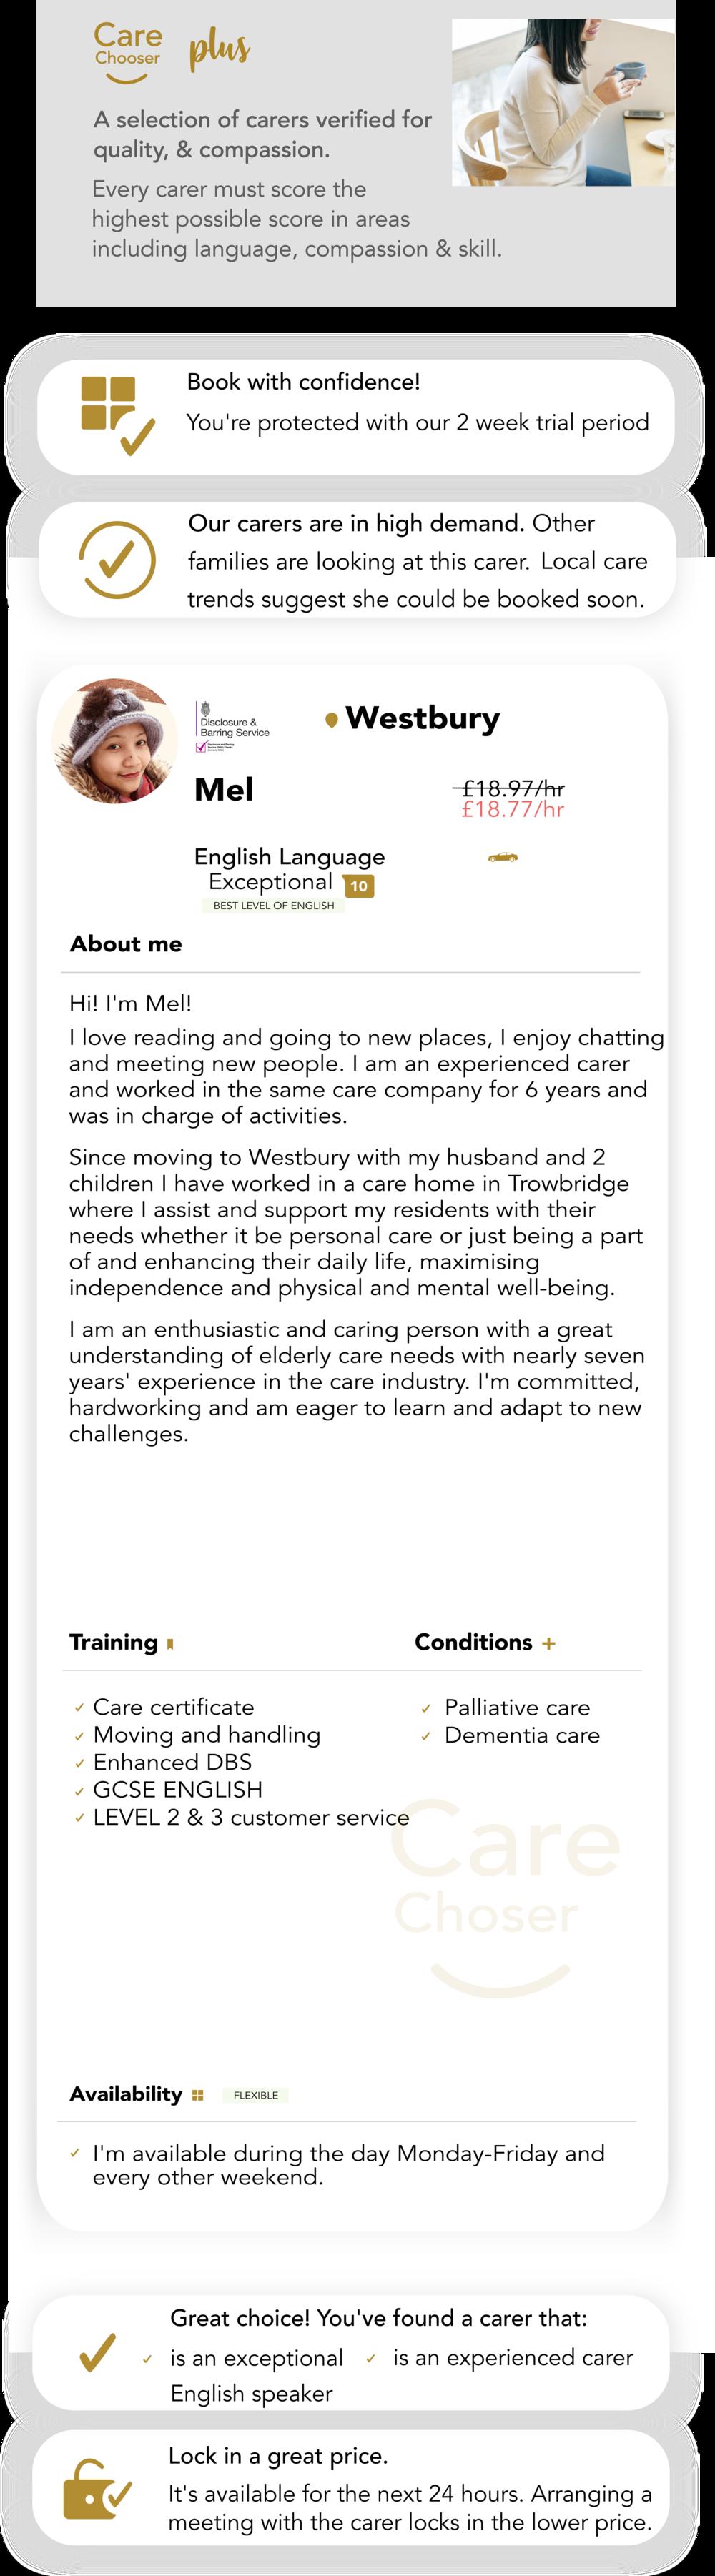 Mel - home care Westbury.png